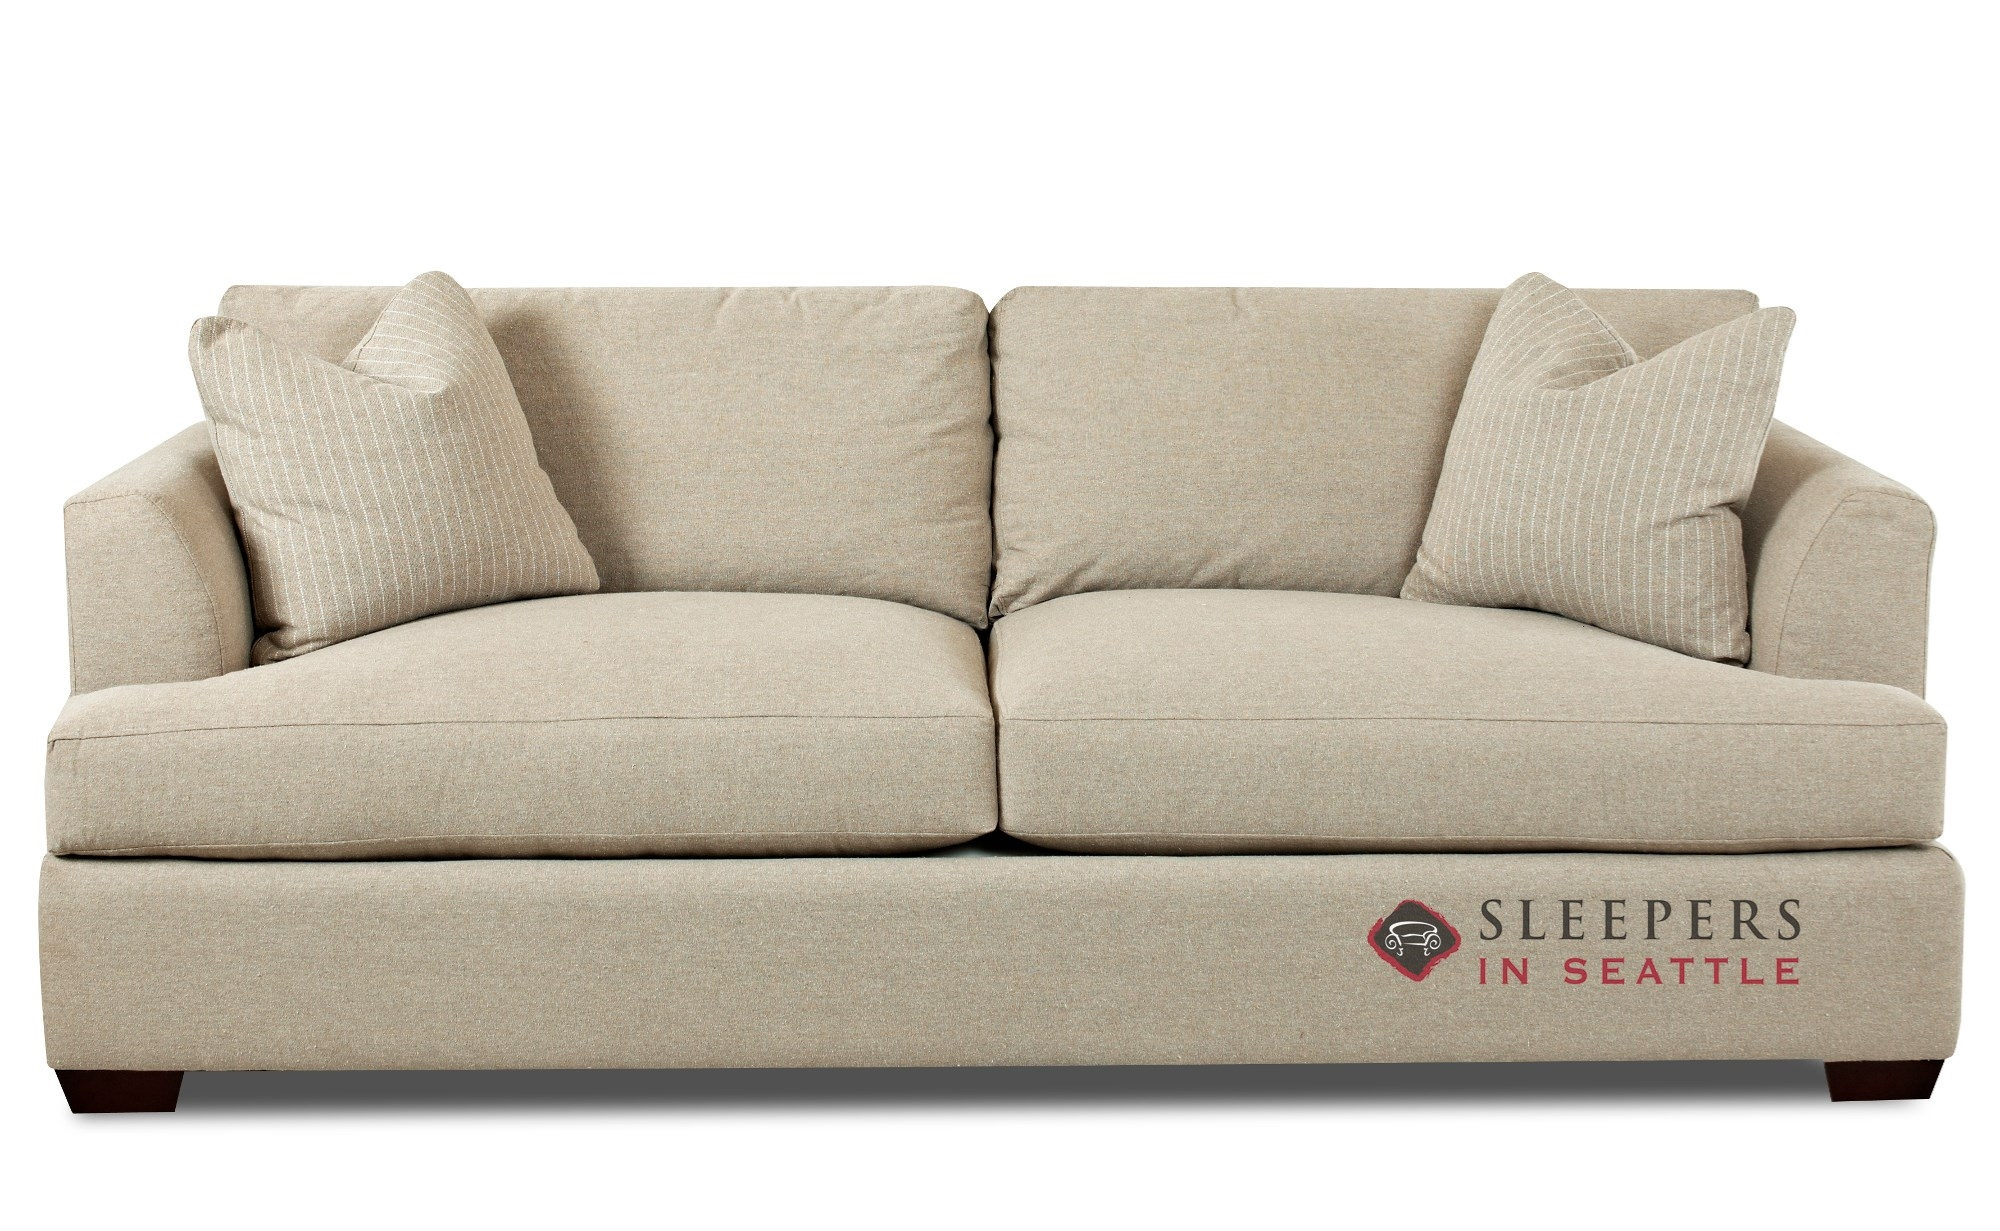 fabric sectional sofas calgary ikea red corner sofa bed sleepers in seattle review bindu bhatia astrology